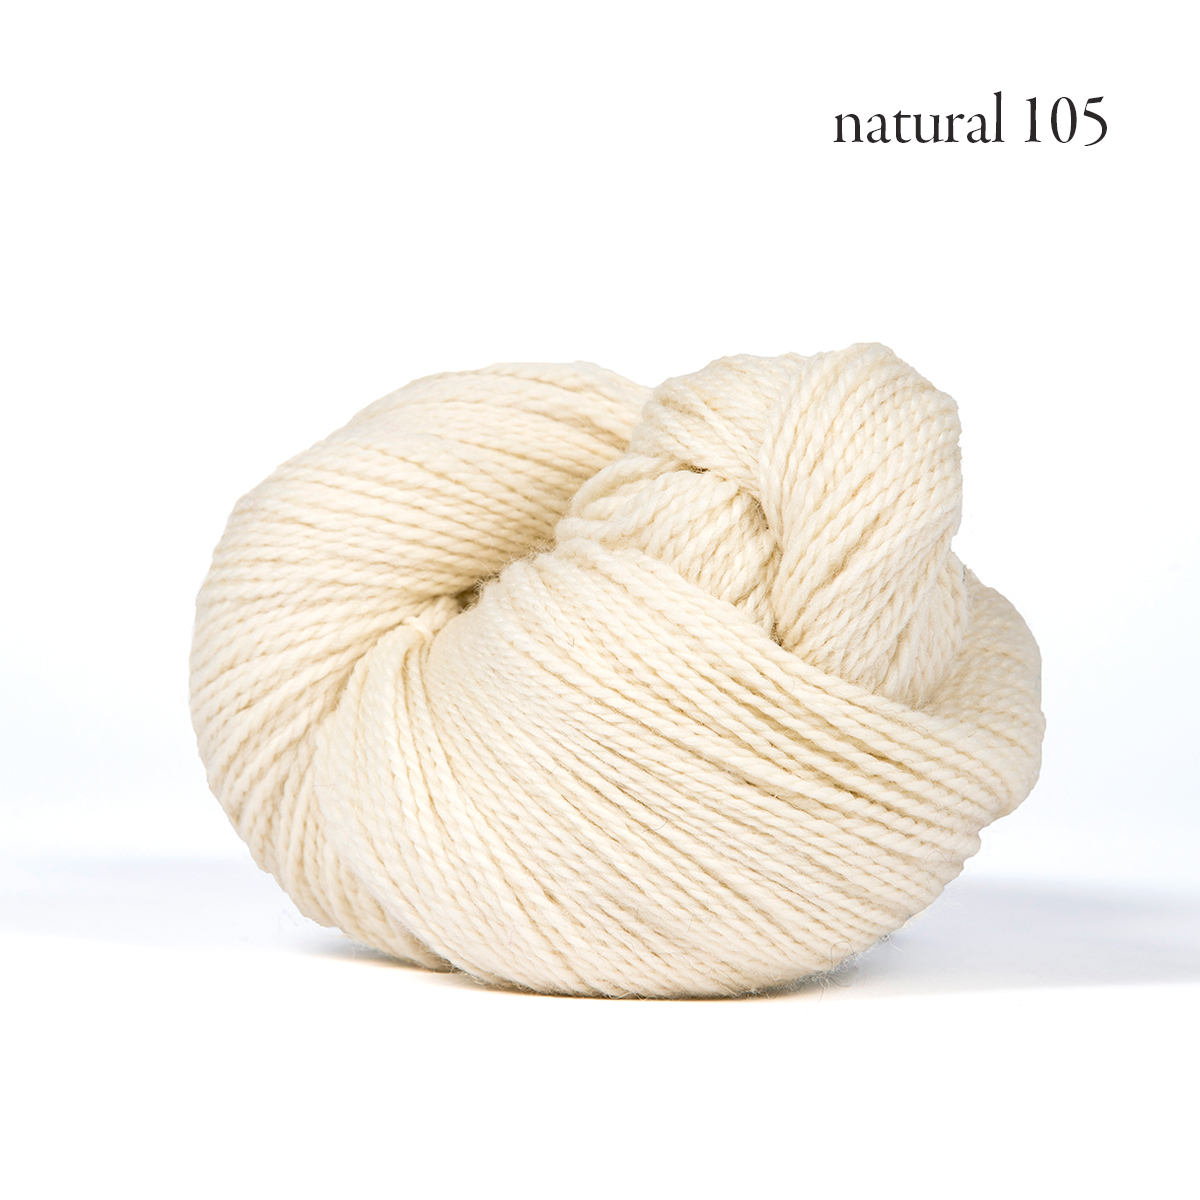 natural+105.jpg